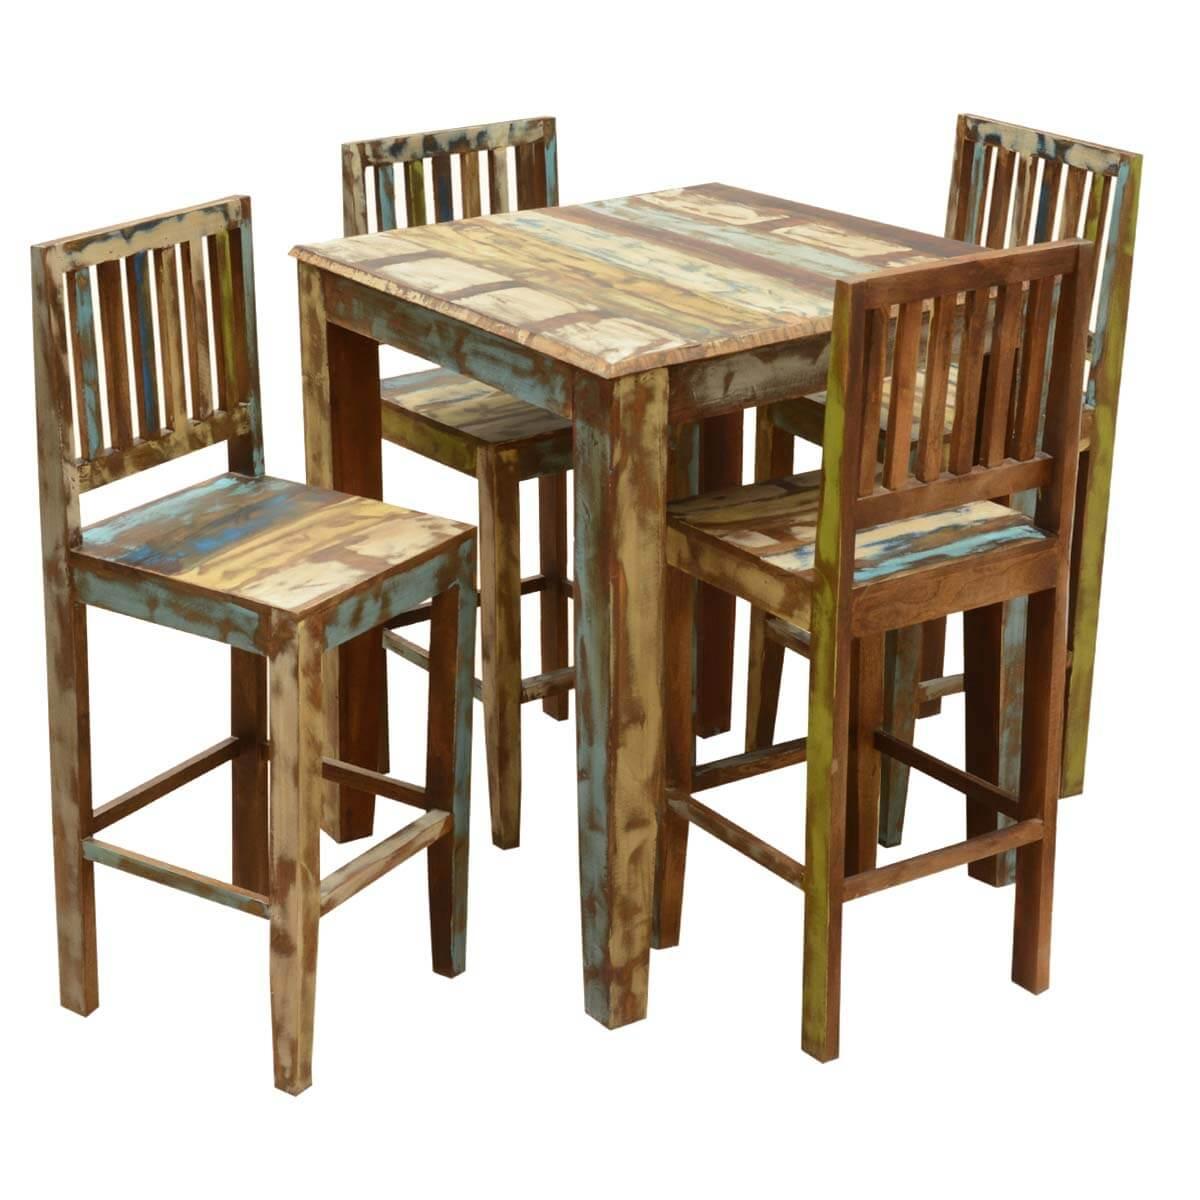 Appalachian Rustic Reclaimed Wood High Bar Table Amp Chair Set